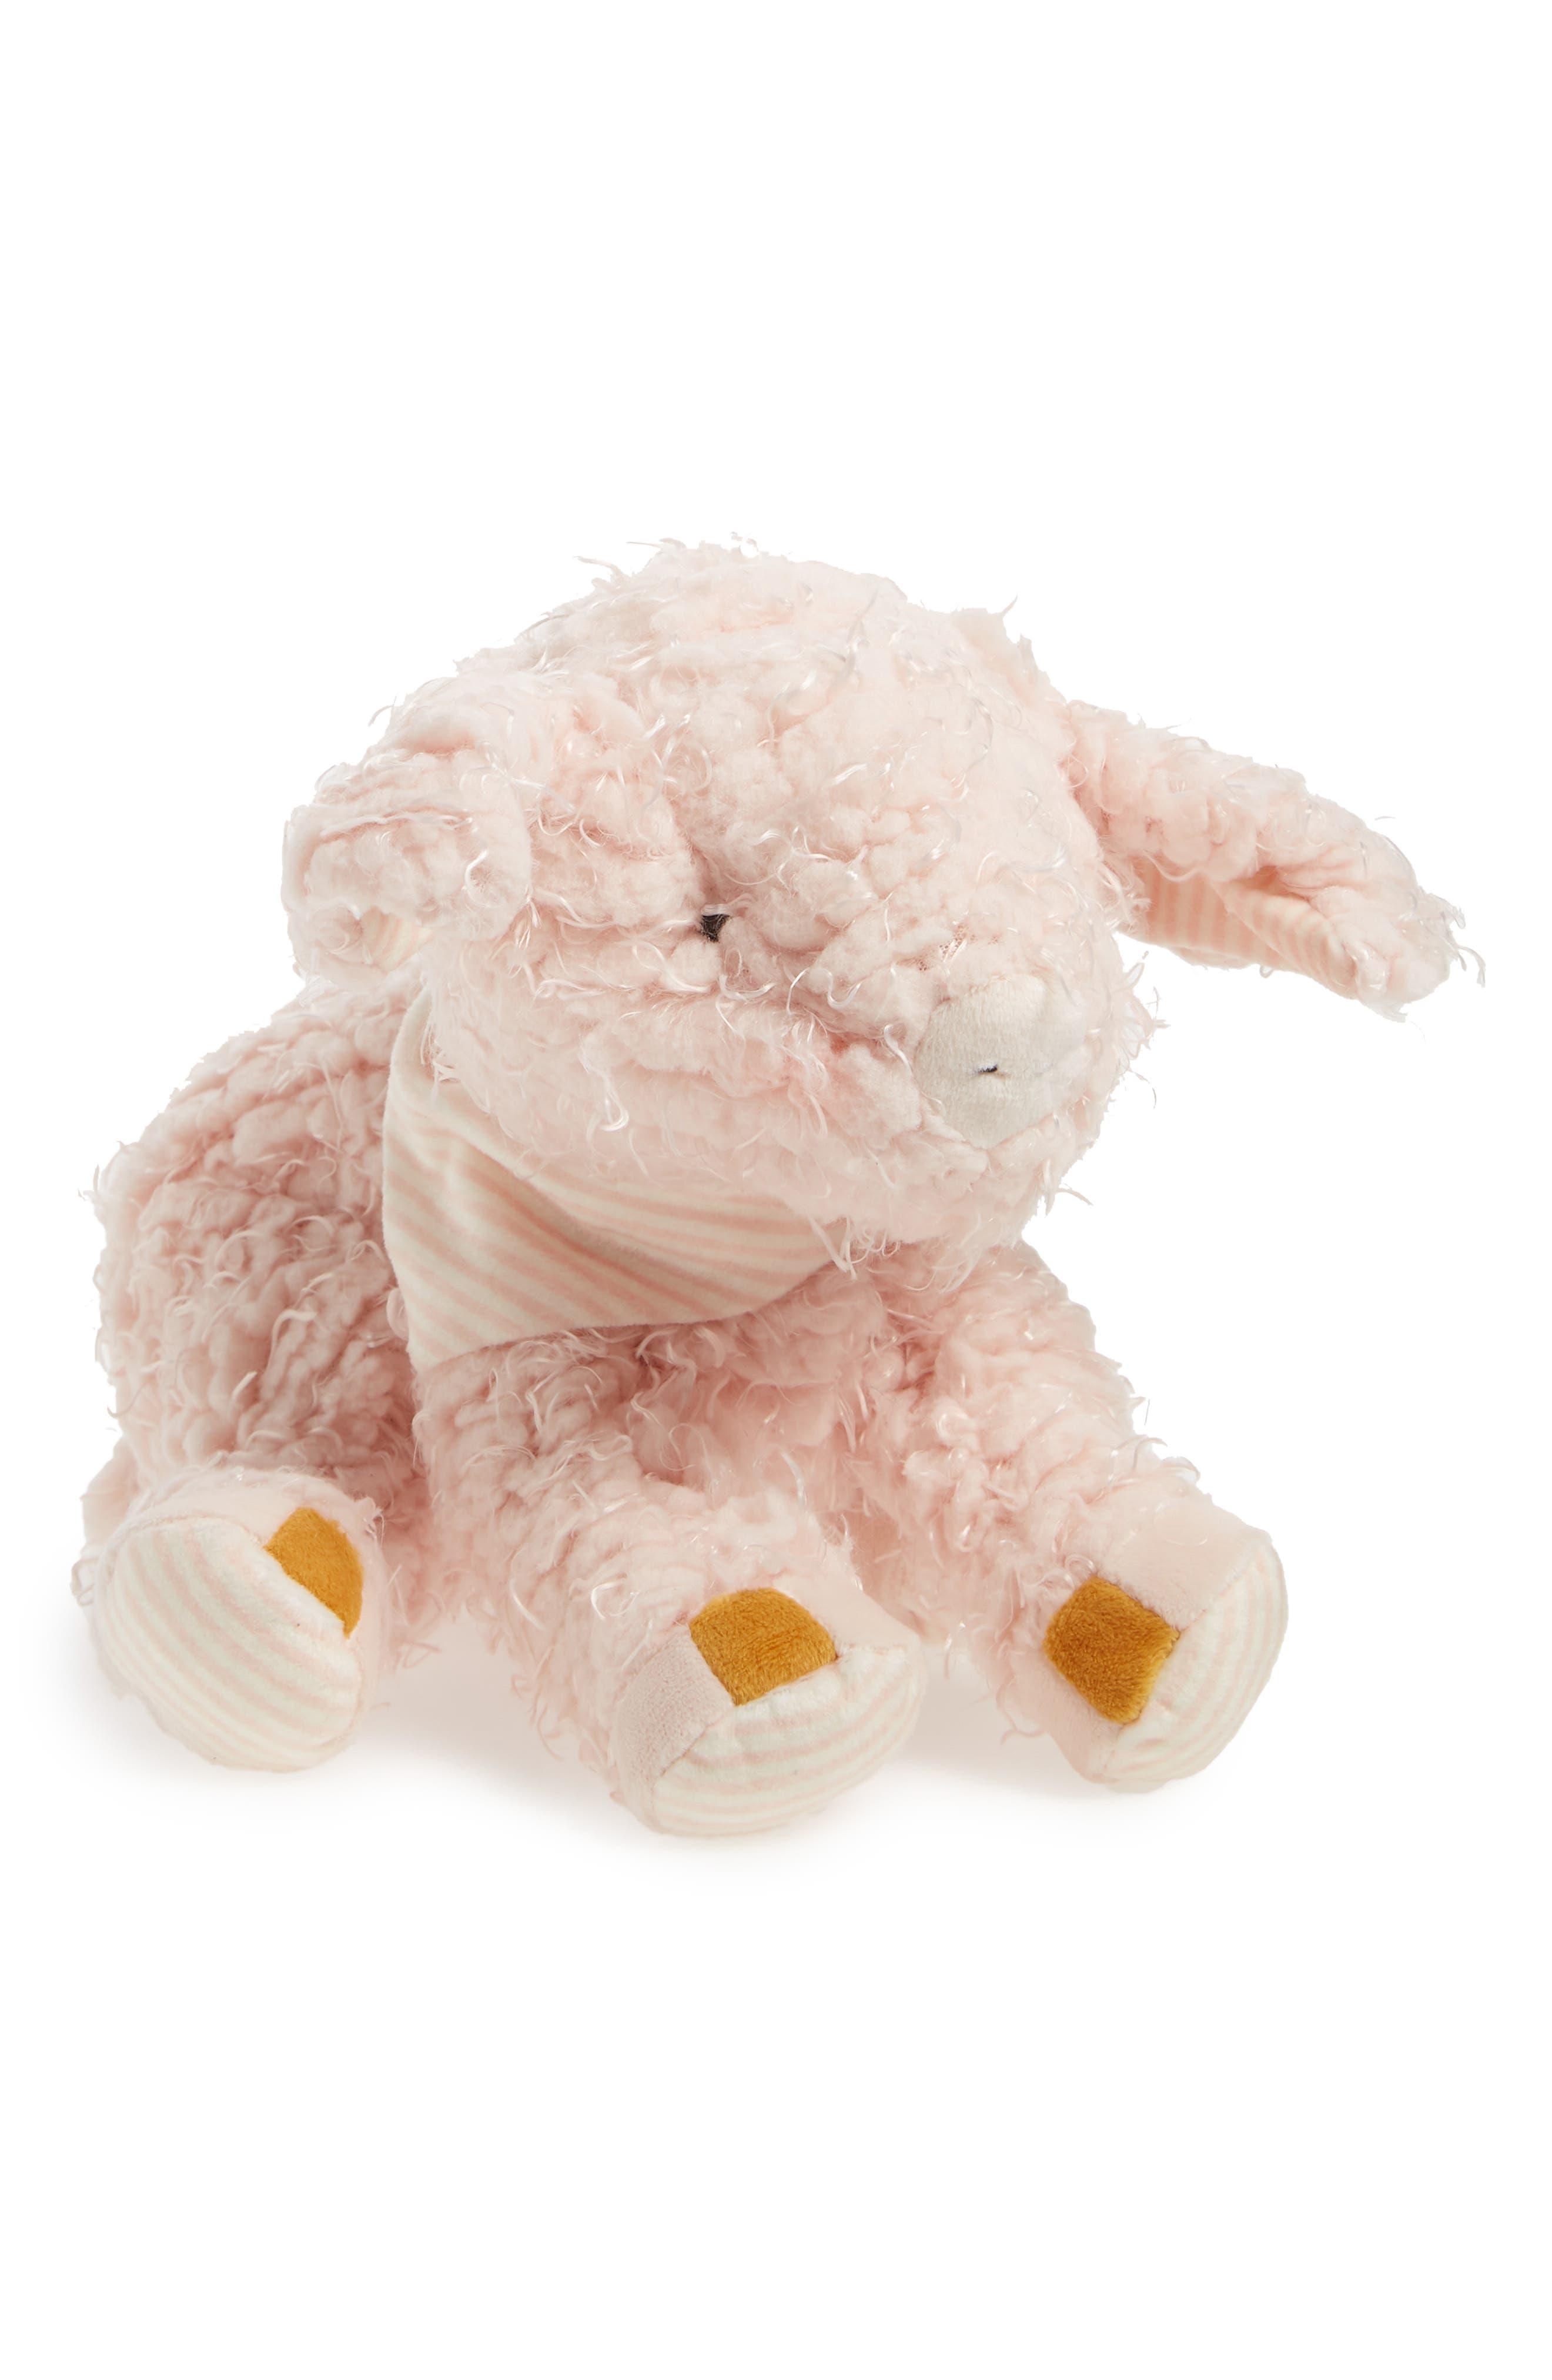 Hammie Pig Stuffed Animal,                             Main thumbnail 1, color,                             680